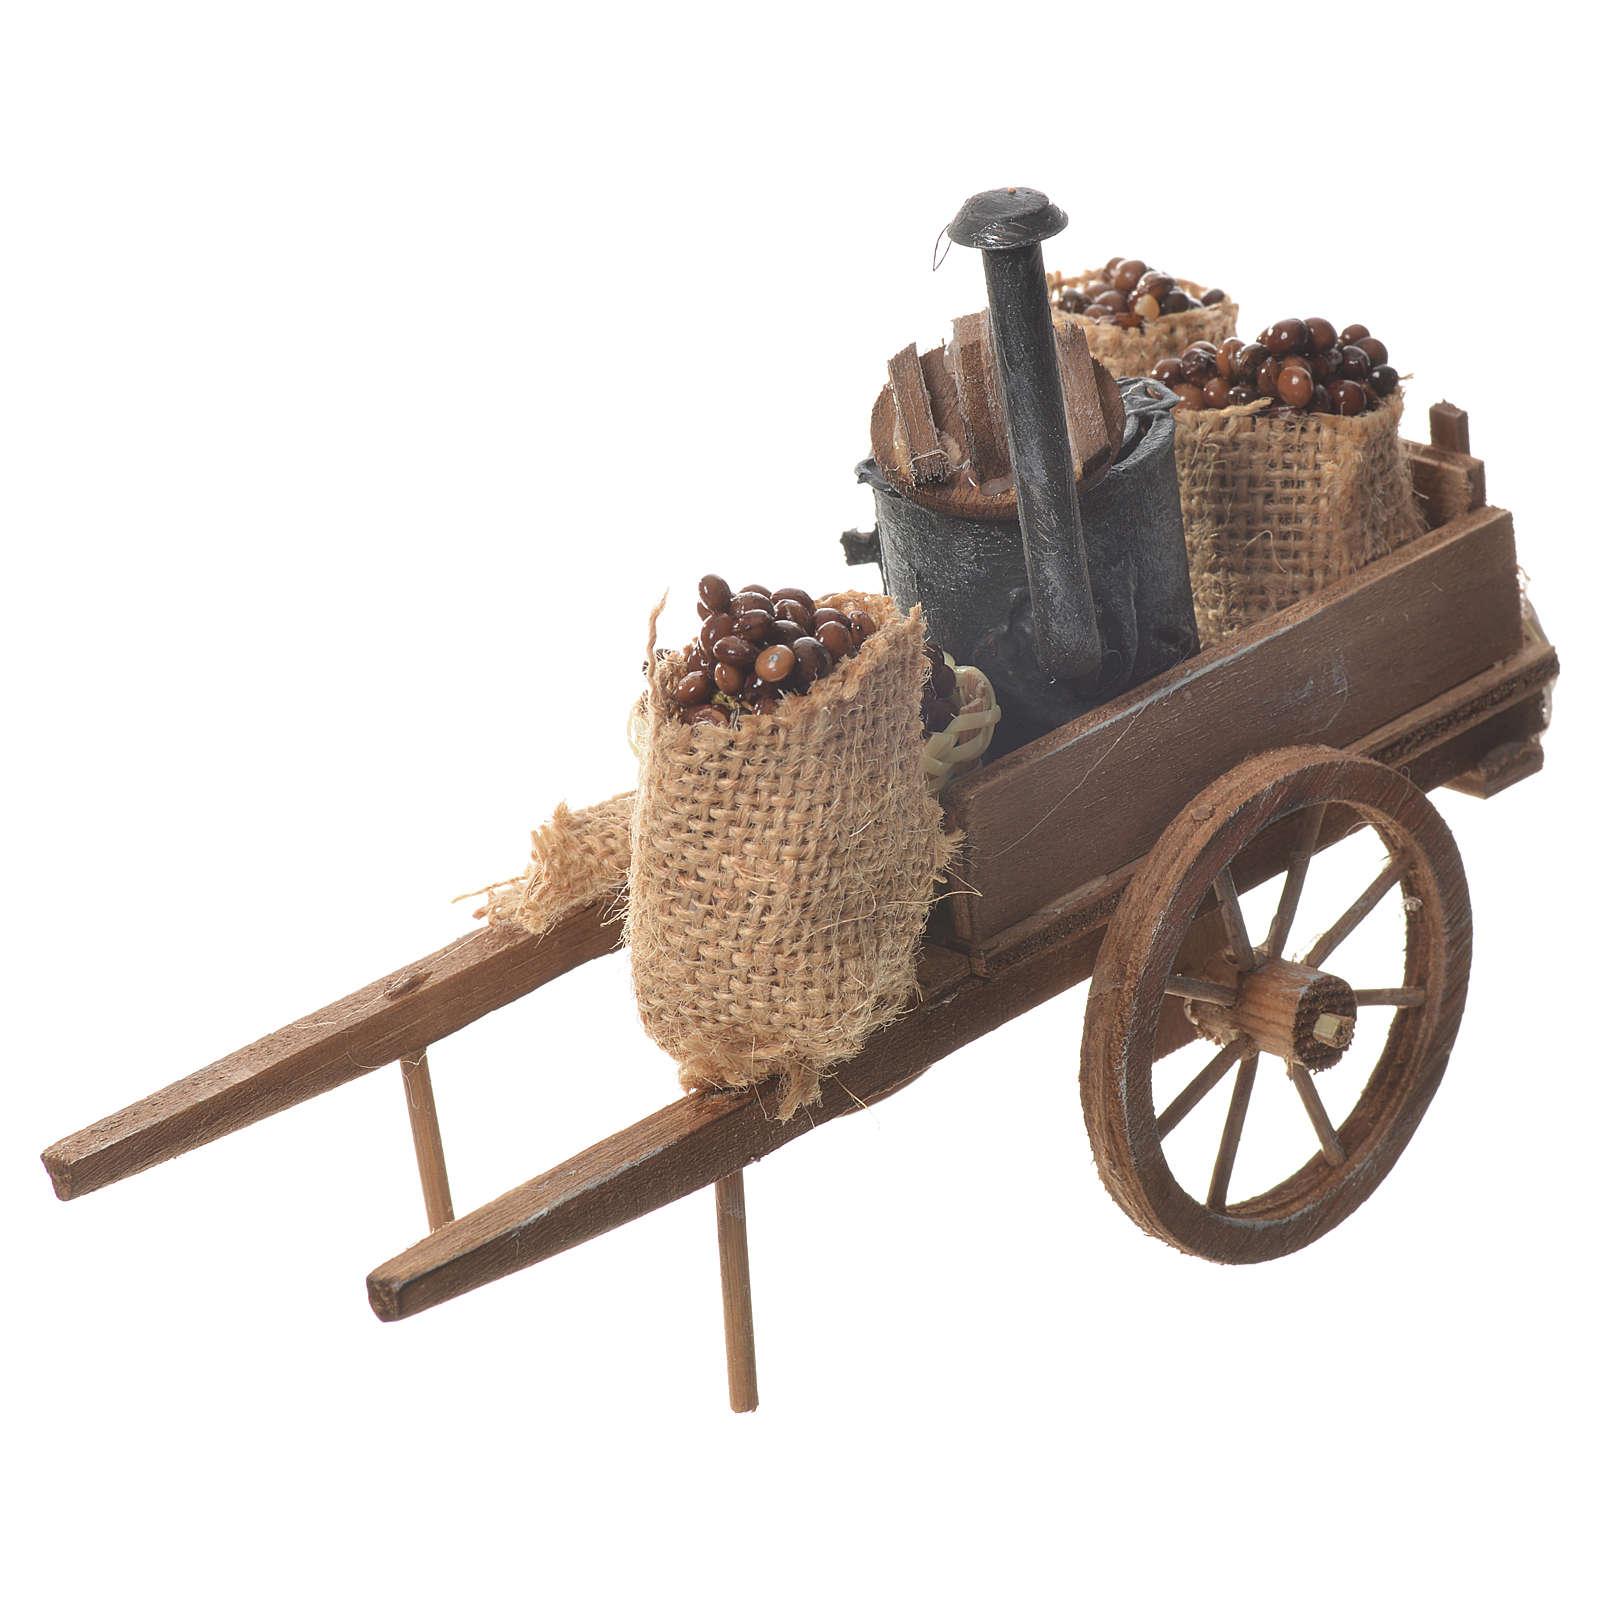 Neapolitan nativity accessory, roasted chestnuts cart 4